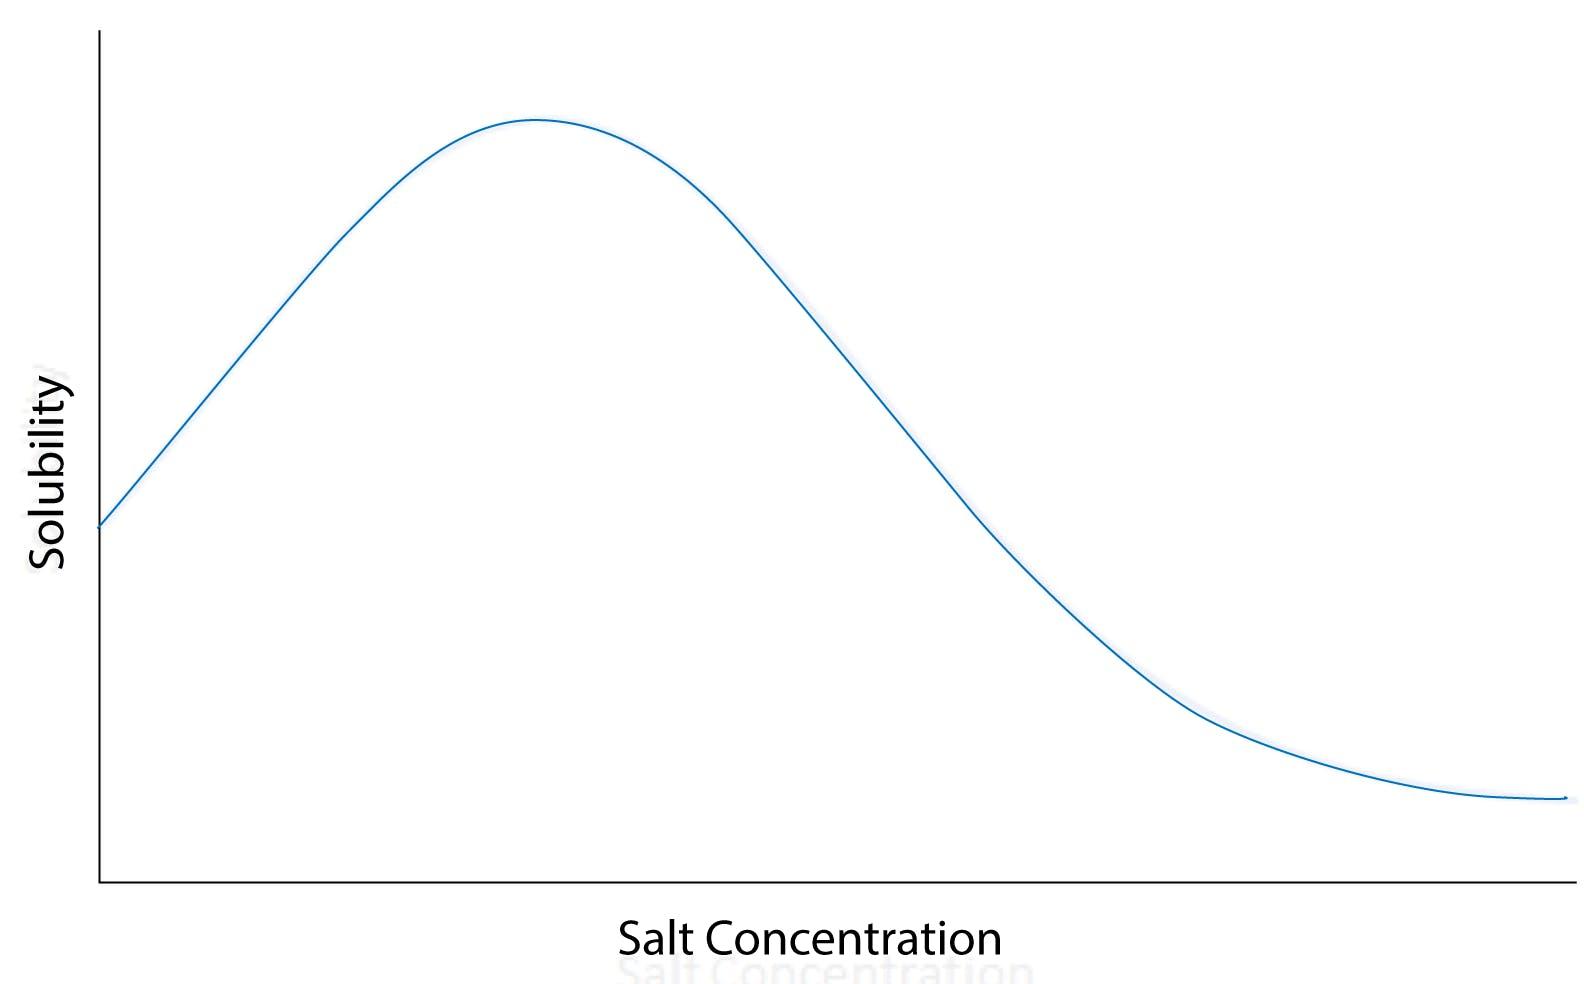 solubility versus salt concentration curve